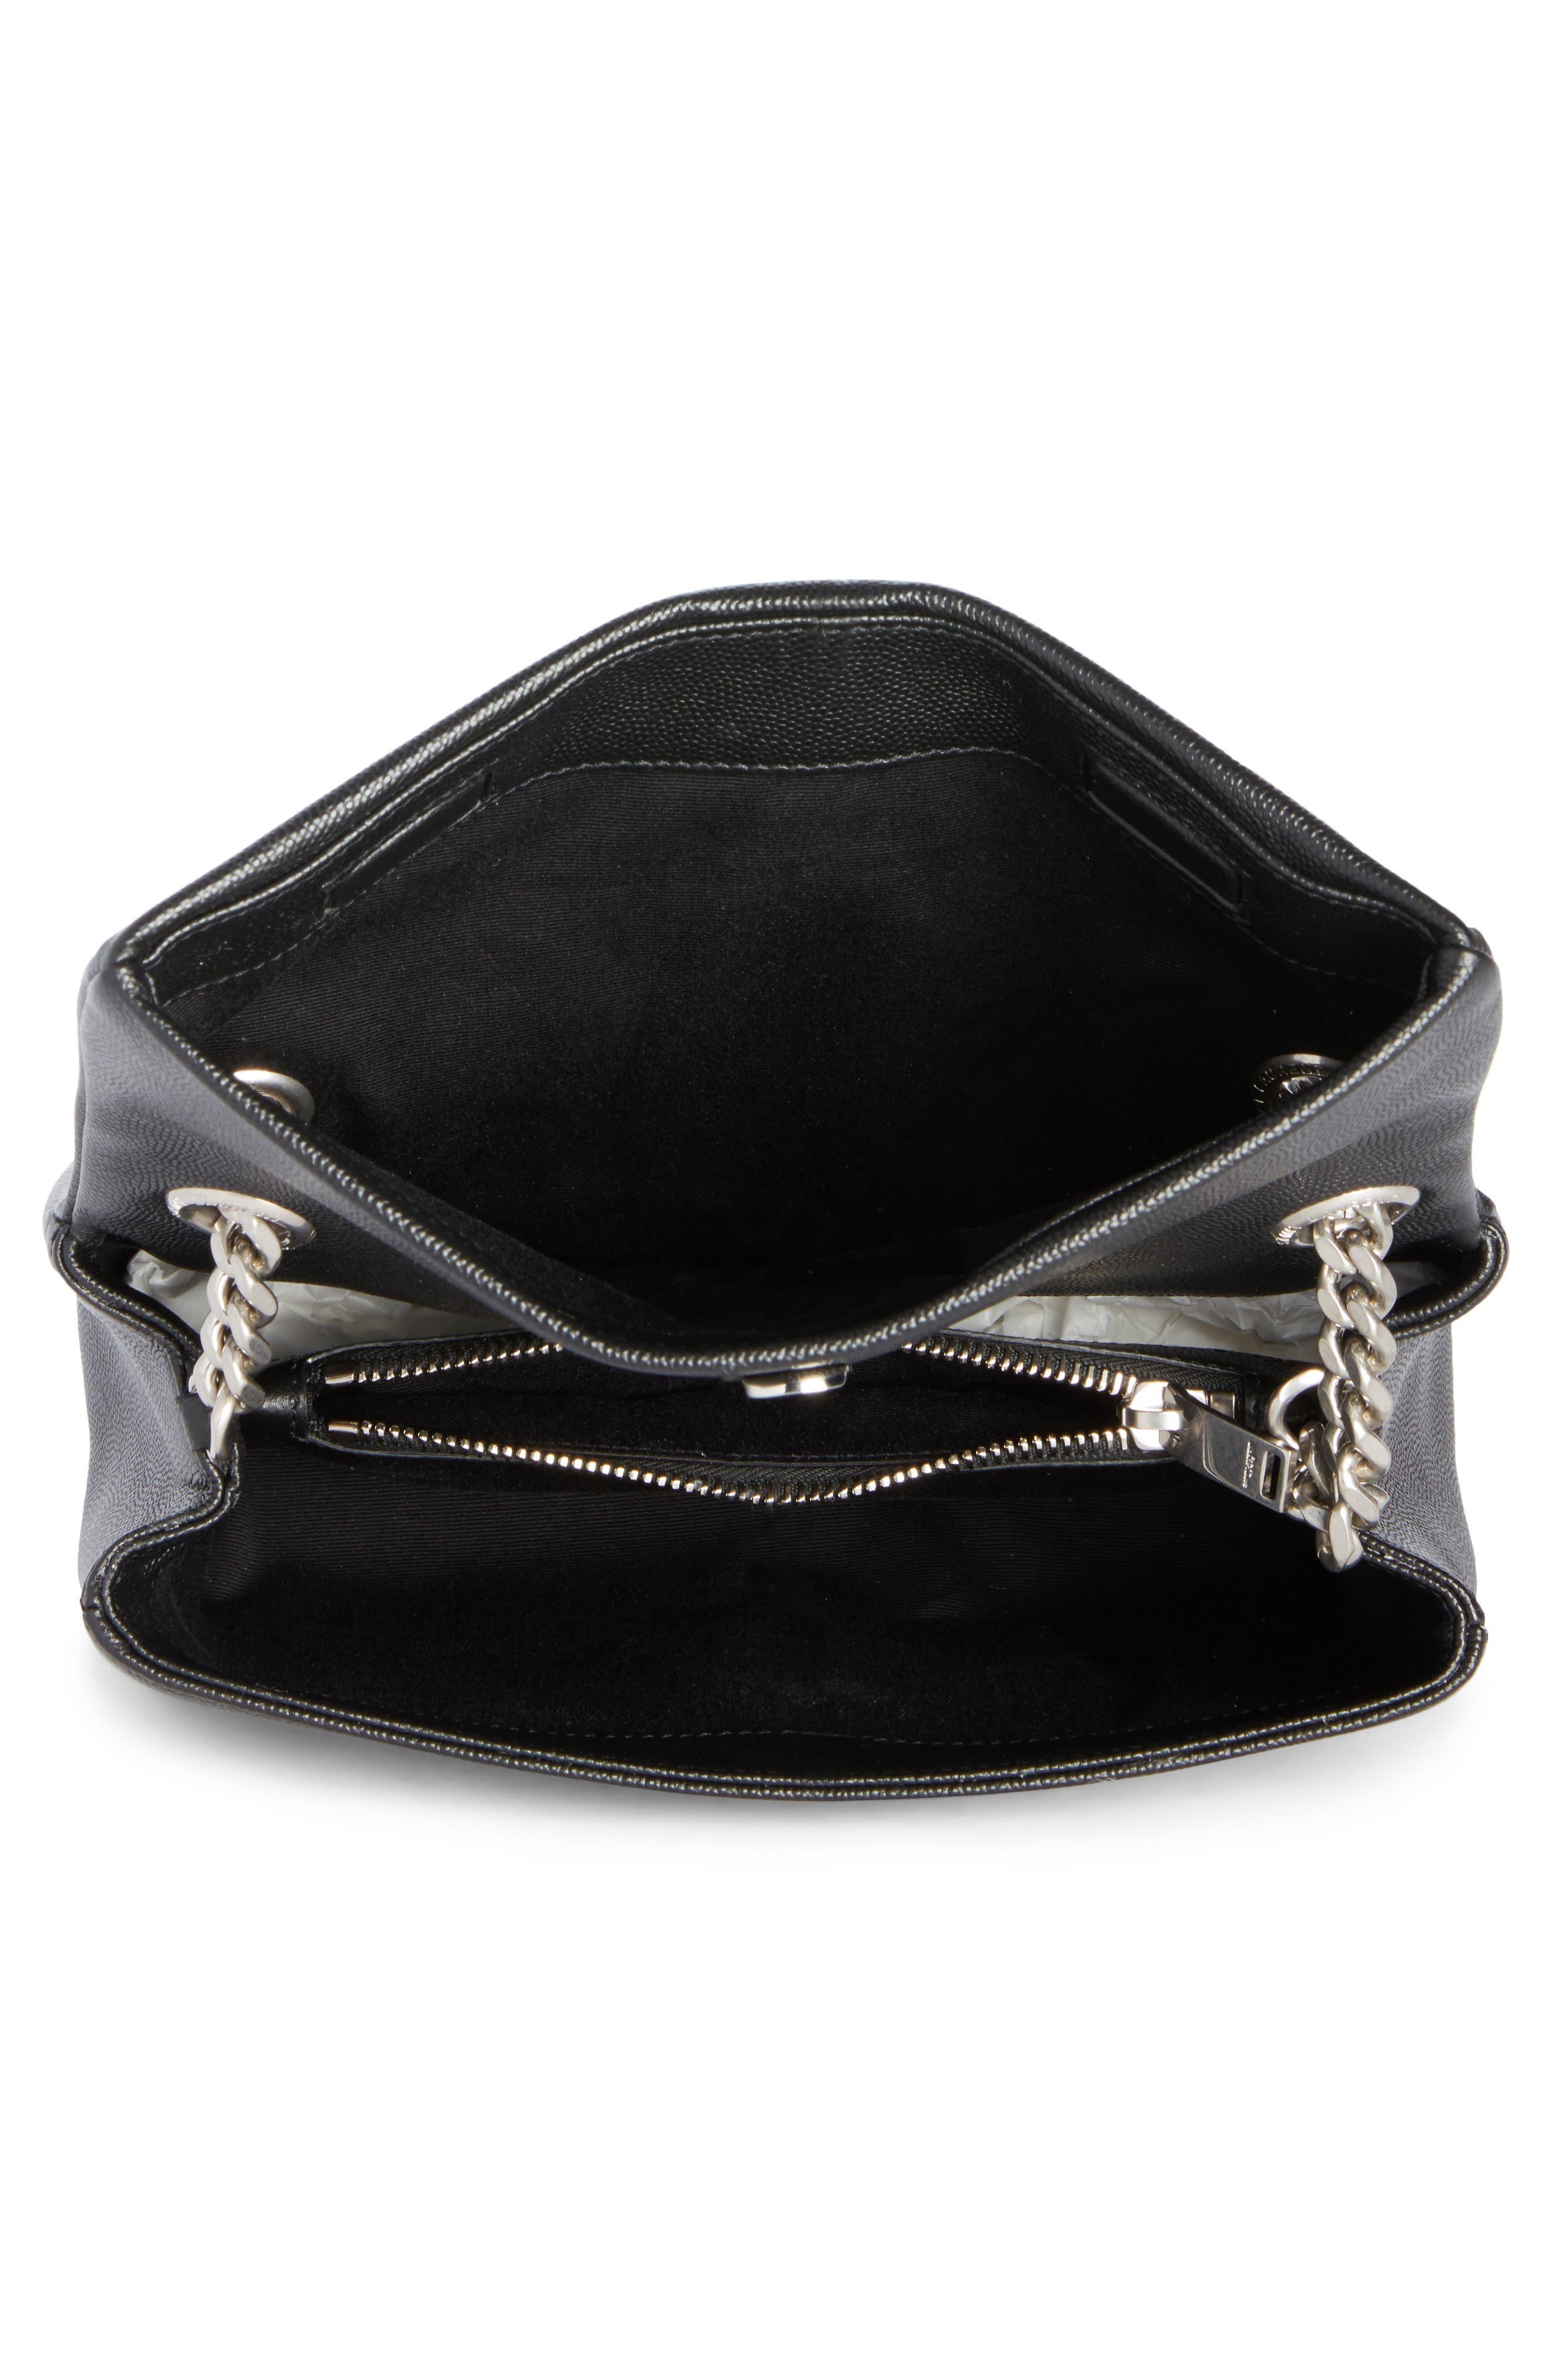 West Hollywood Calfskin Leather Messenger Bag,                             Alternate thumbnail 13, color,